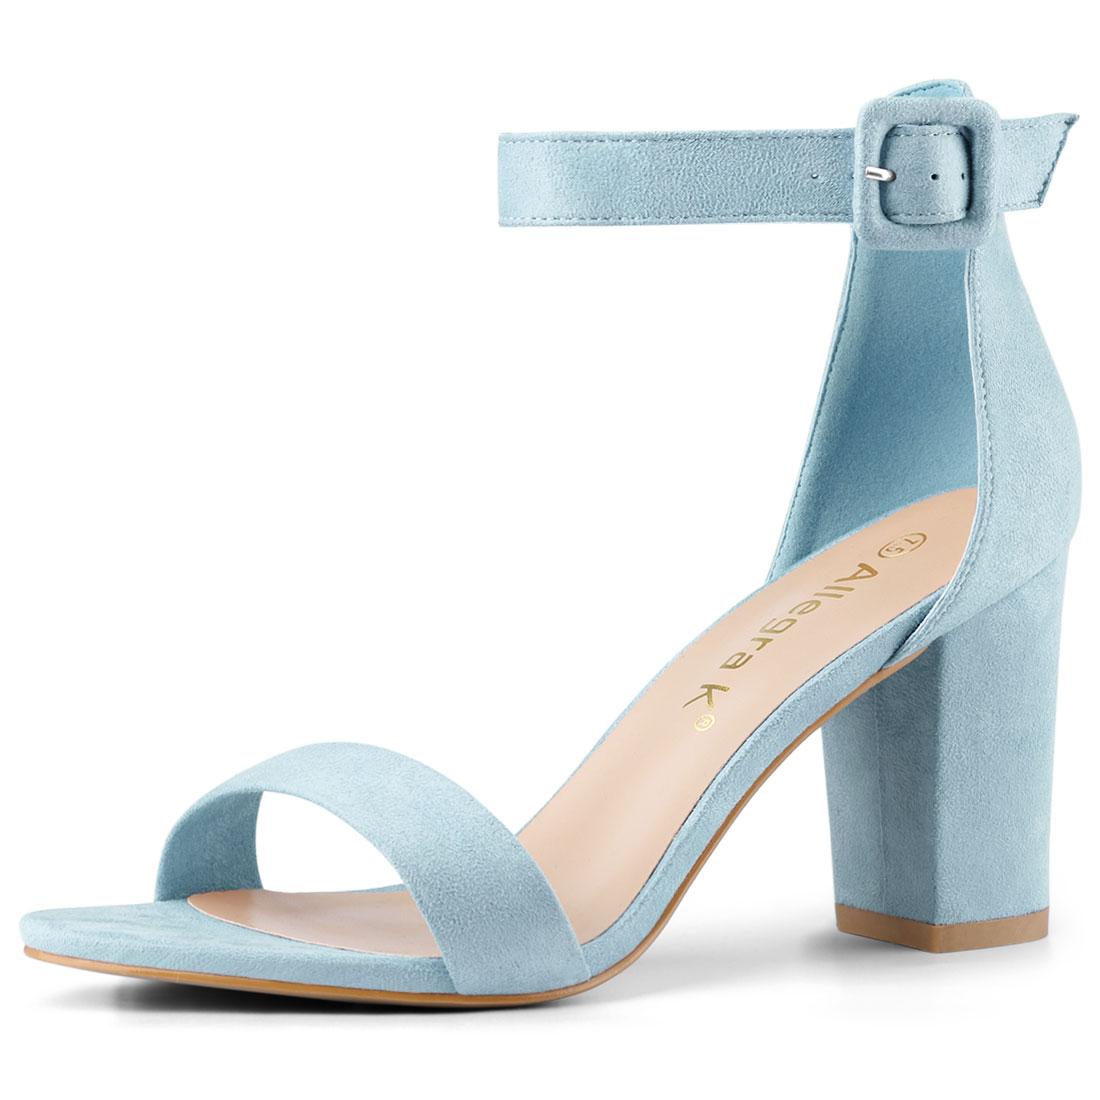 Allegra K Women's Open Toe Chunky High Heel Ankle Strap Sandals Sky Blue US 8.5